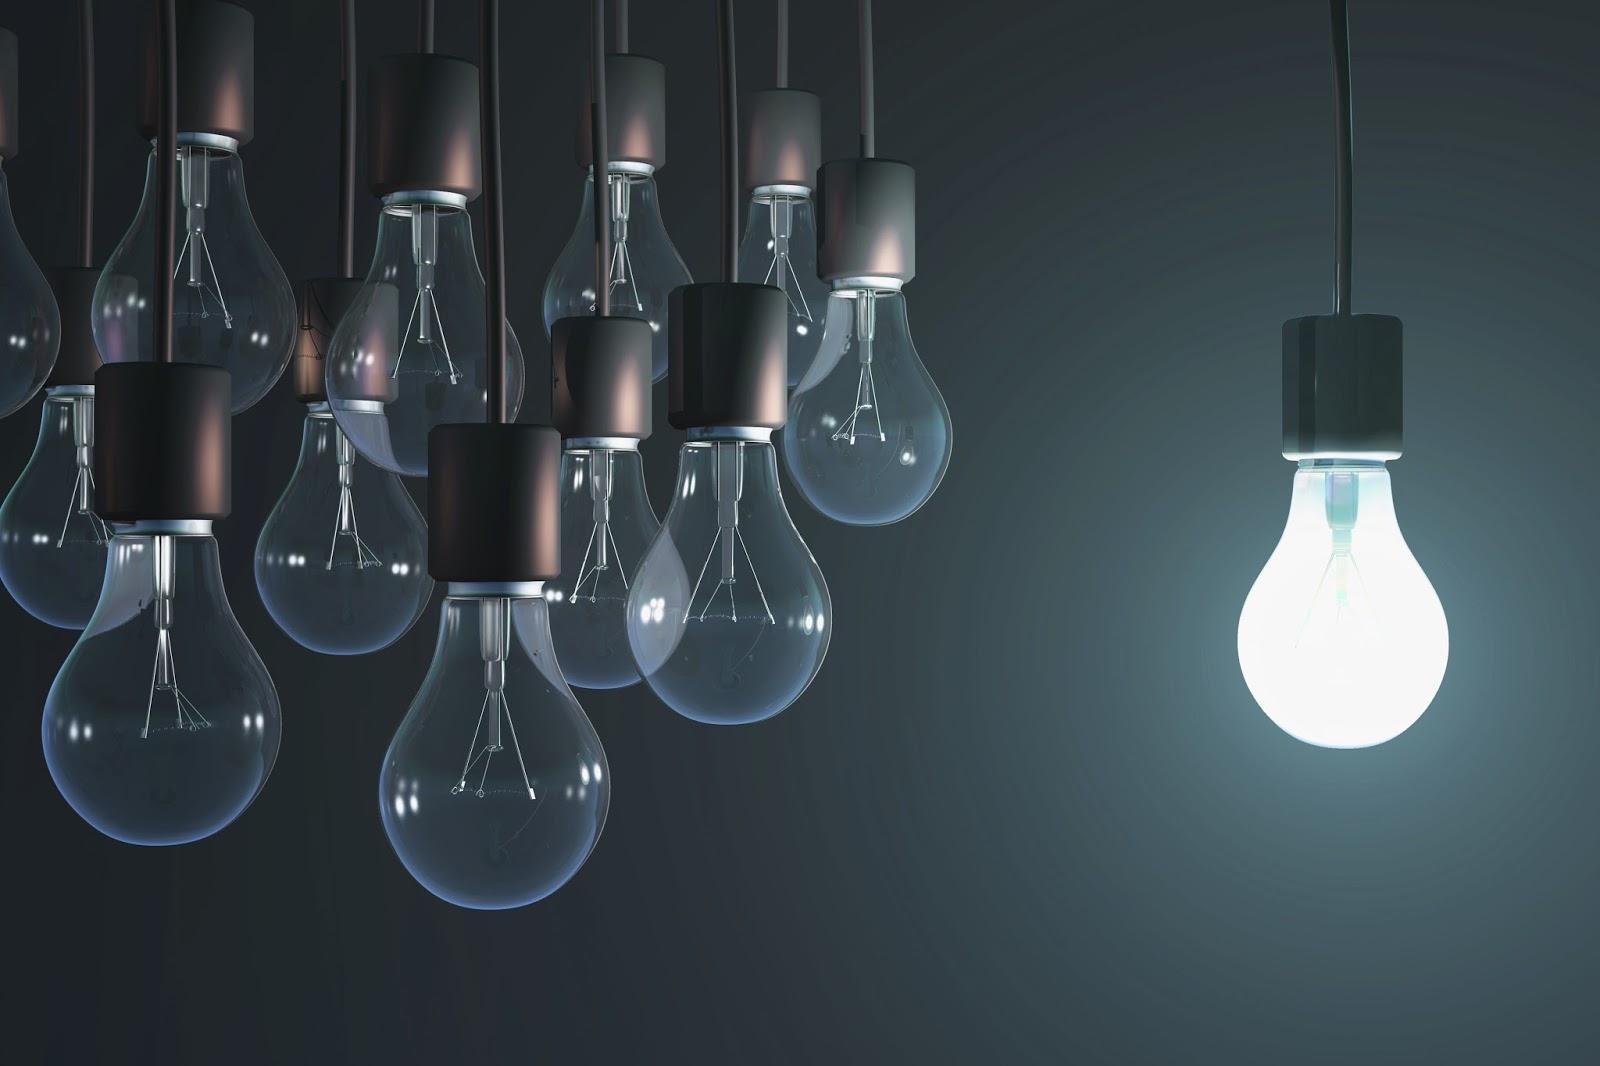 3 Ways MYOB Advanced Has Disrupted The Mid-Market ERP Software Landscape